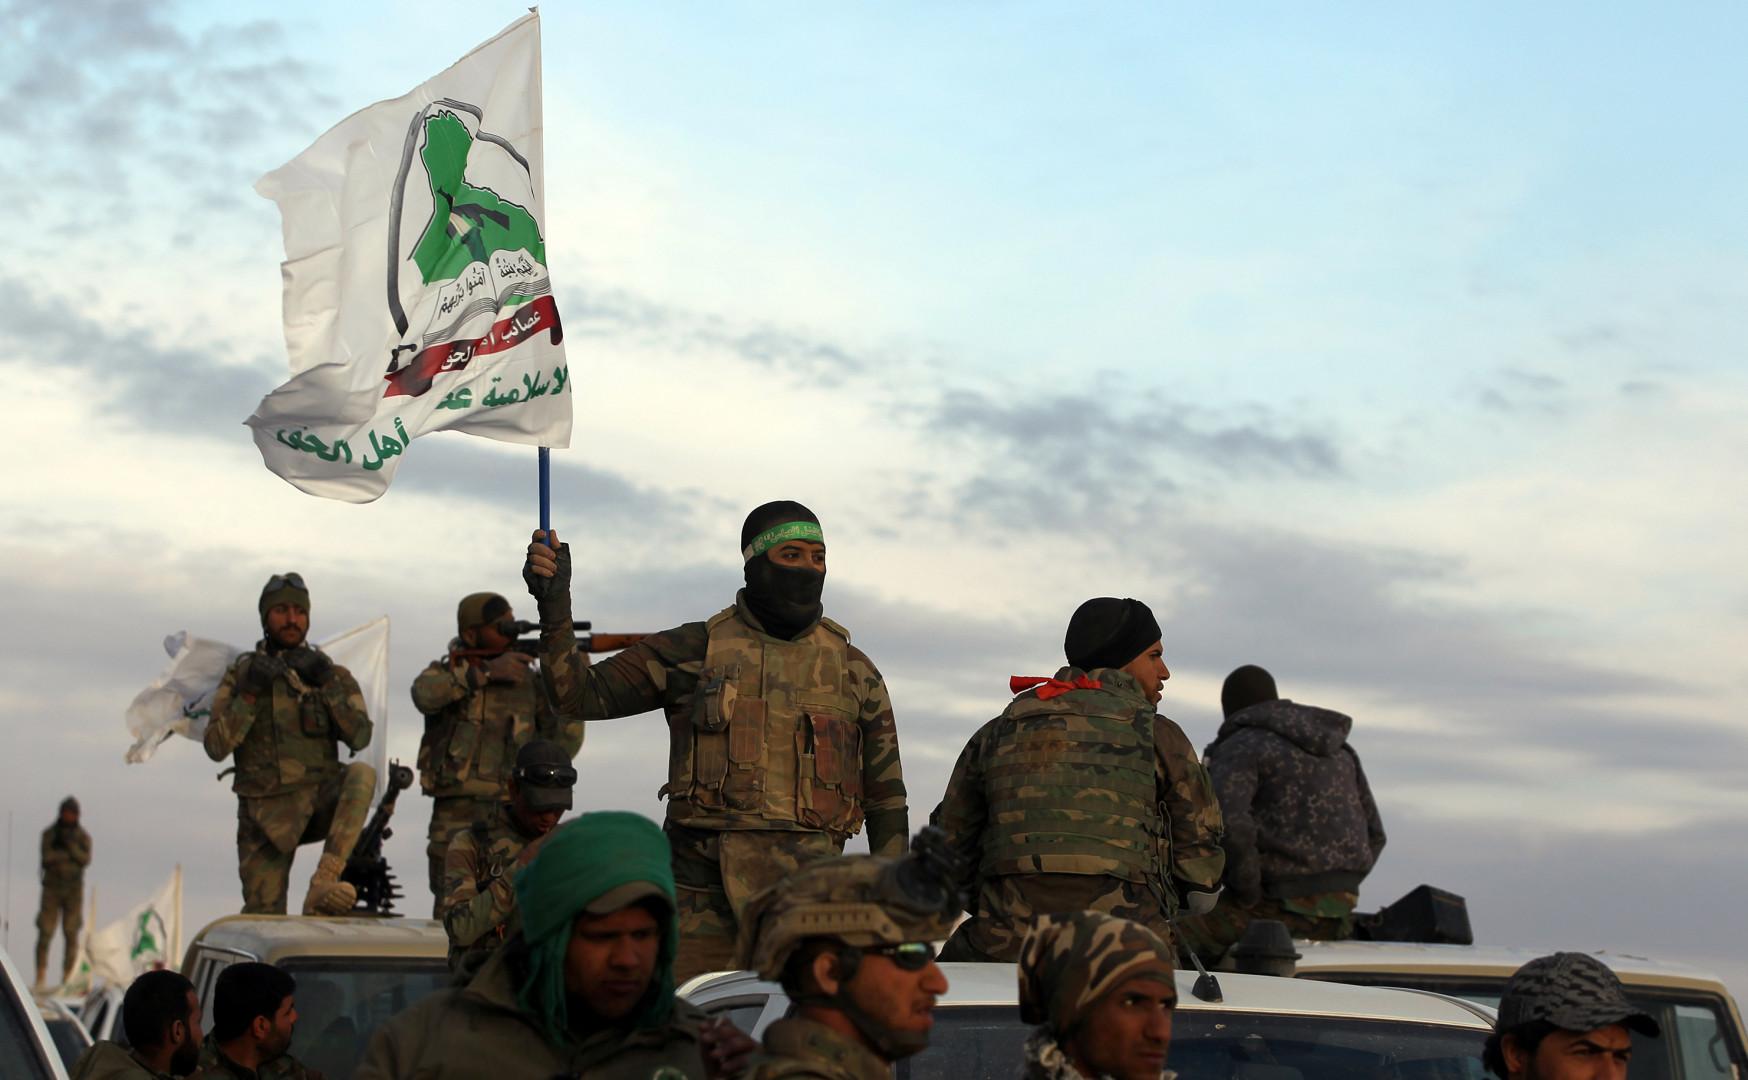 U.S. sanctions Kata'ib Hezbollah and Asa'ib Ahl al-Haq.. Hezbollah responded